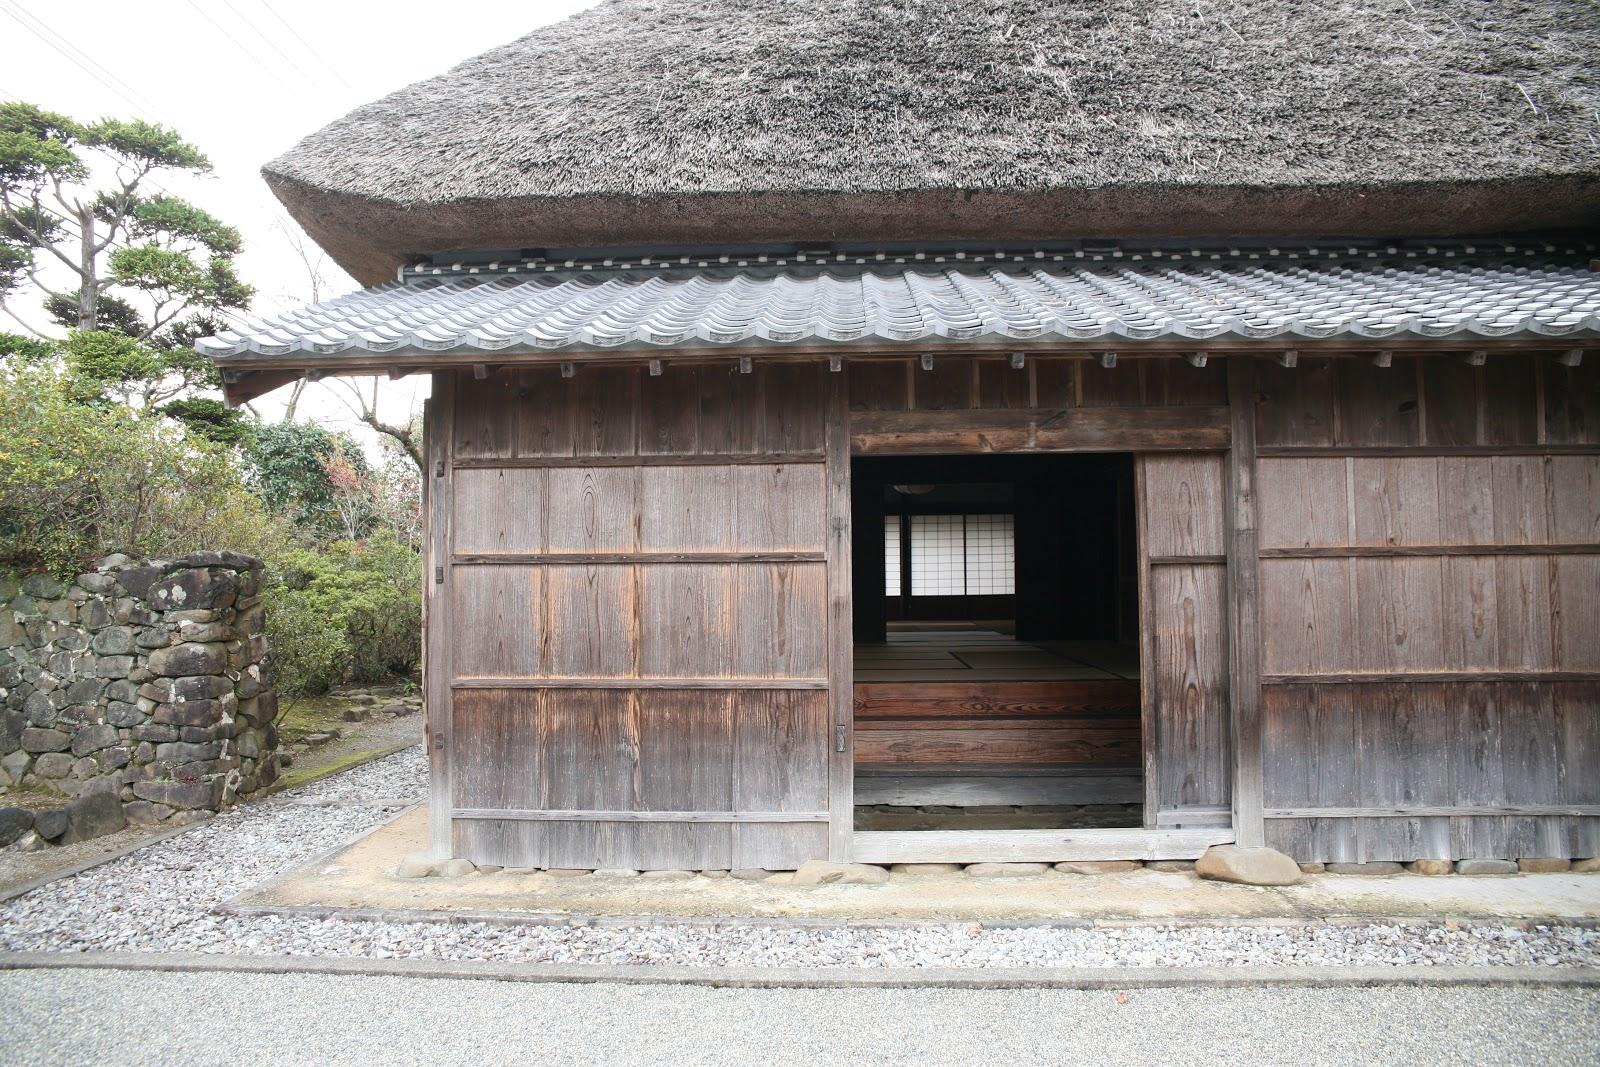 茅葺屋根の外観